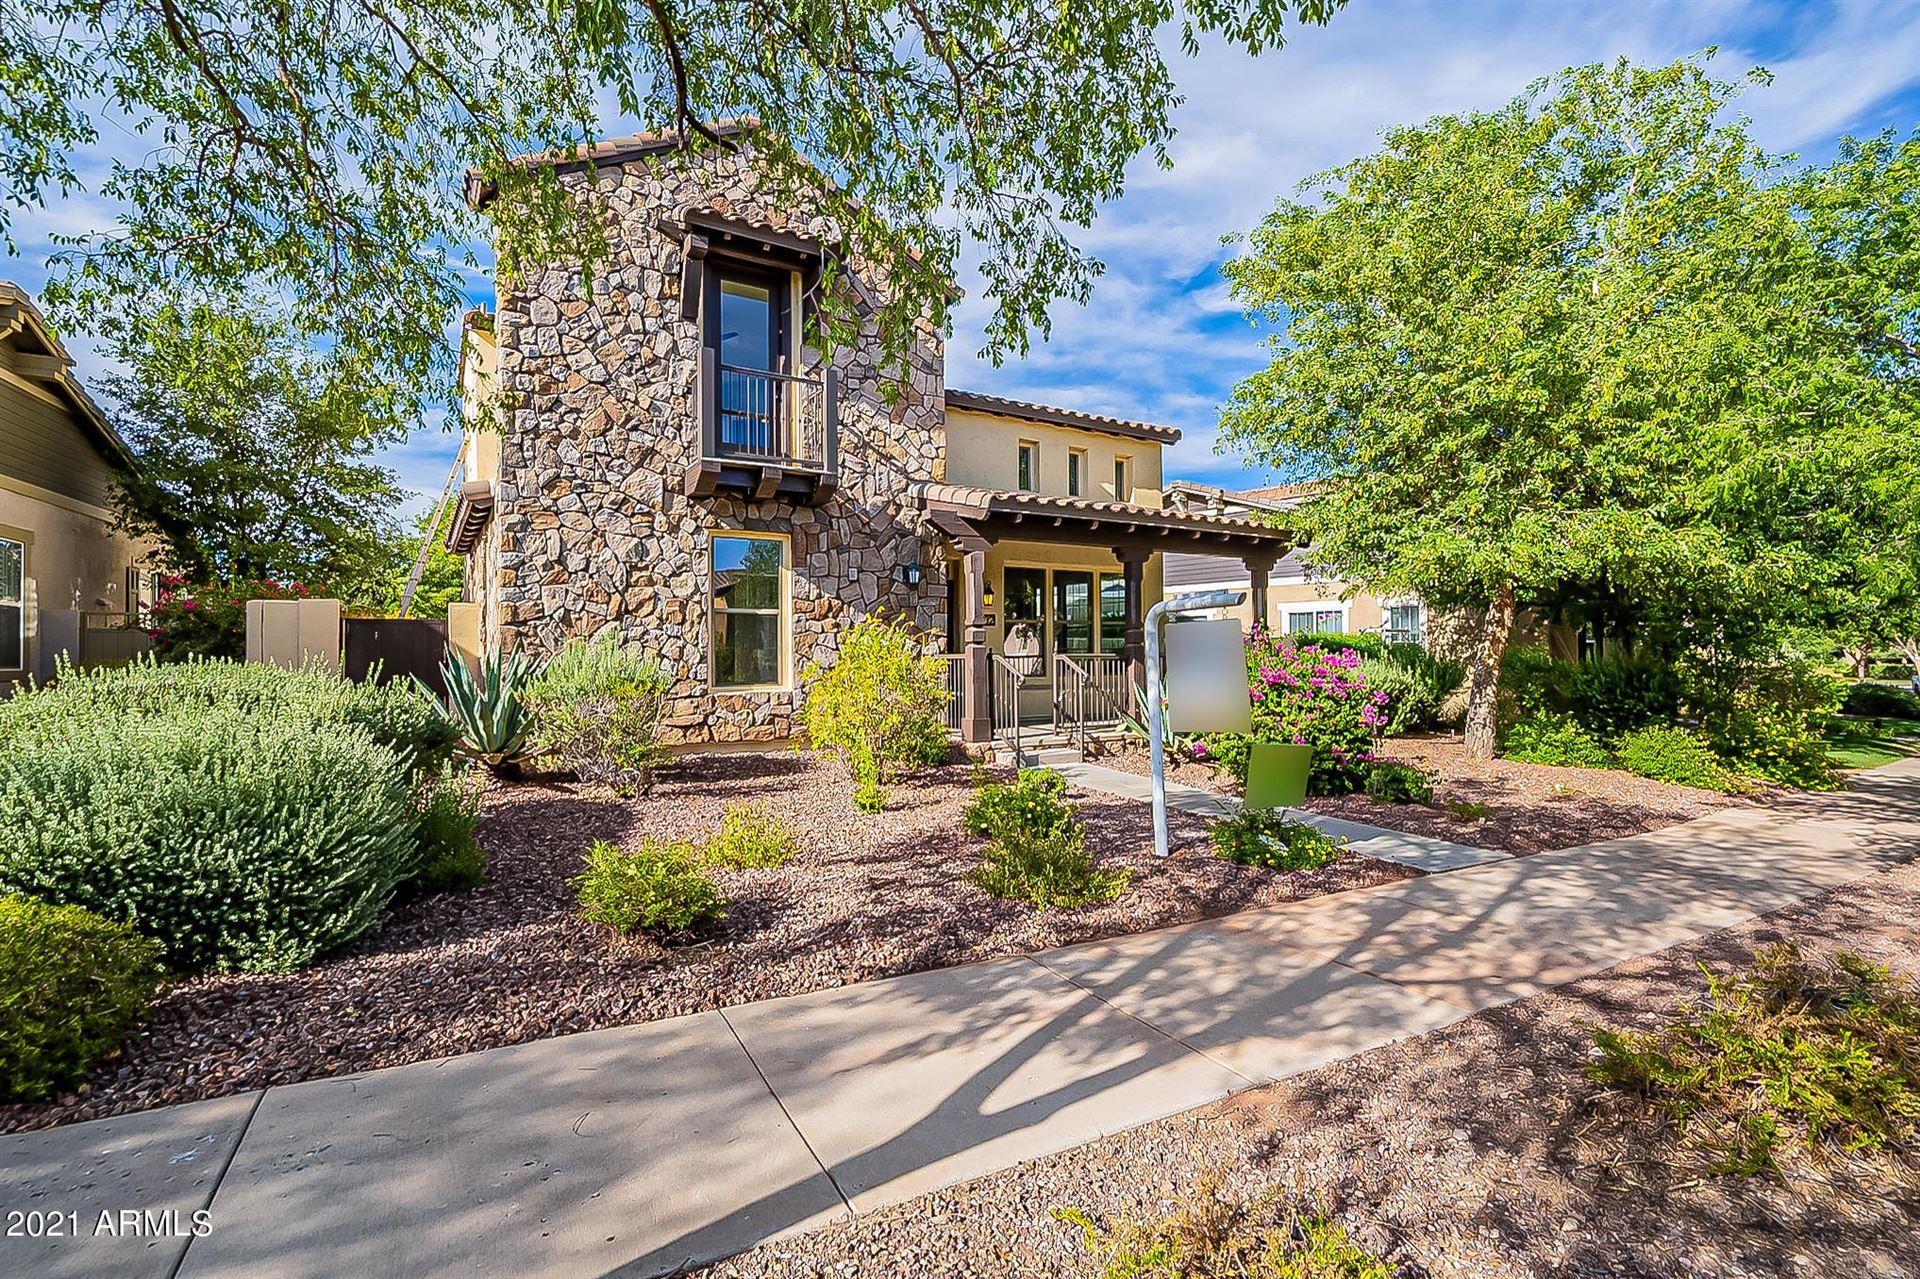 Photo of 3932 N FOUNDER Circle, Buckeye, AZ 85396 (MLS # 6246573)